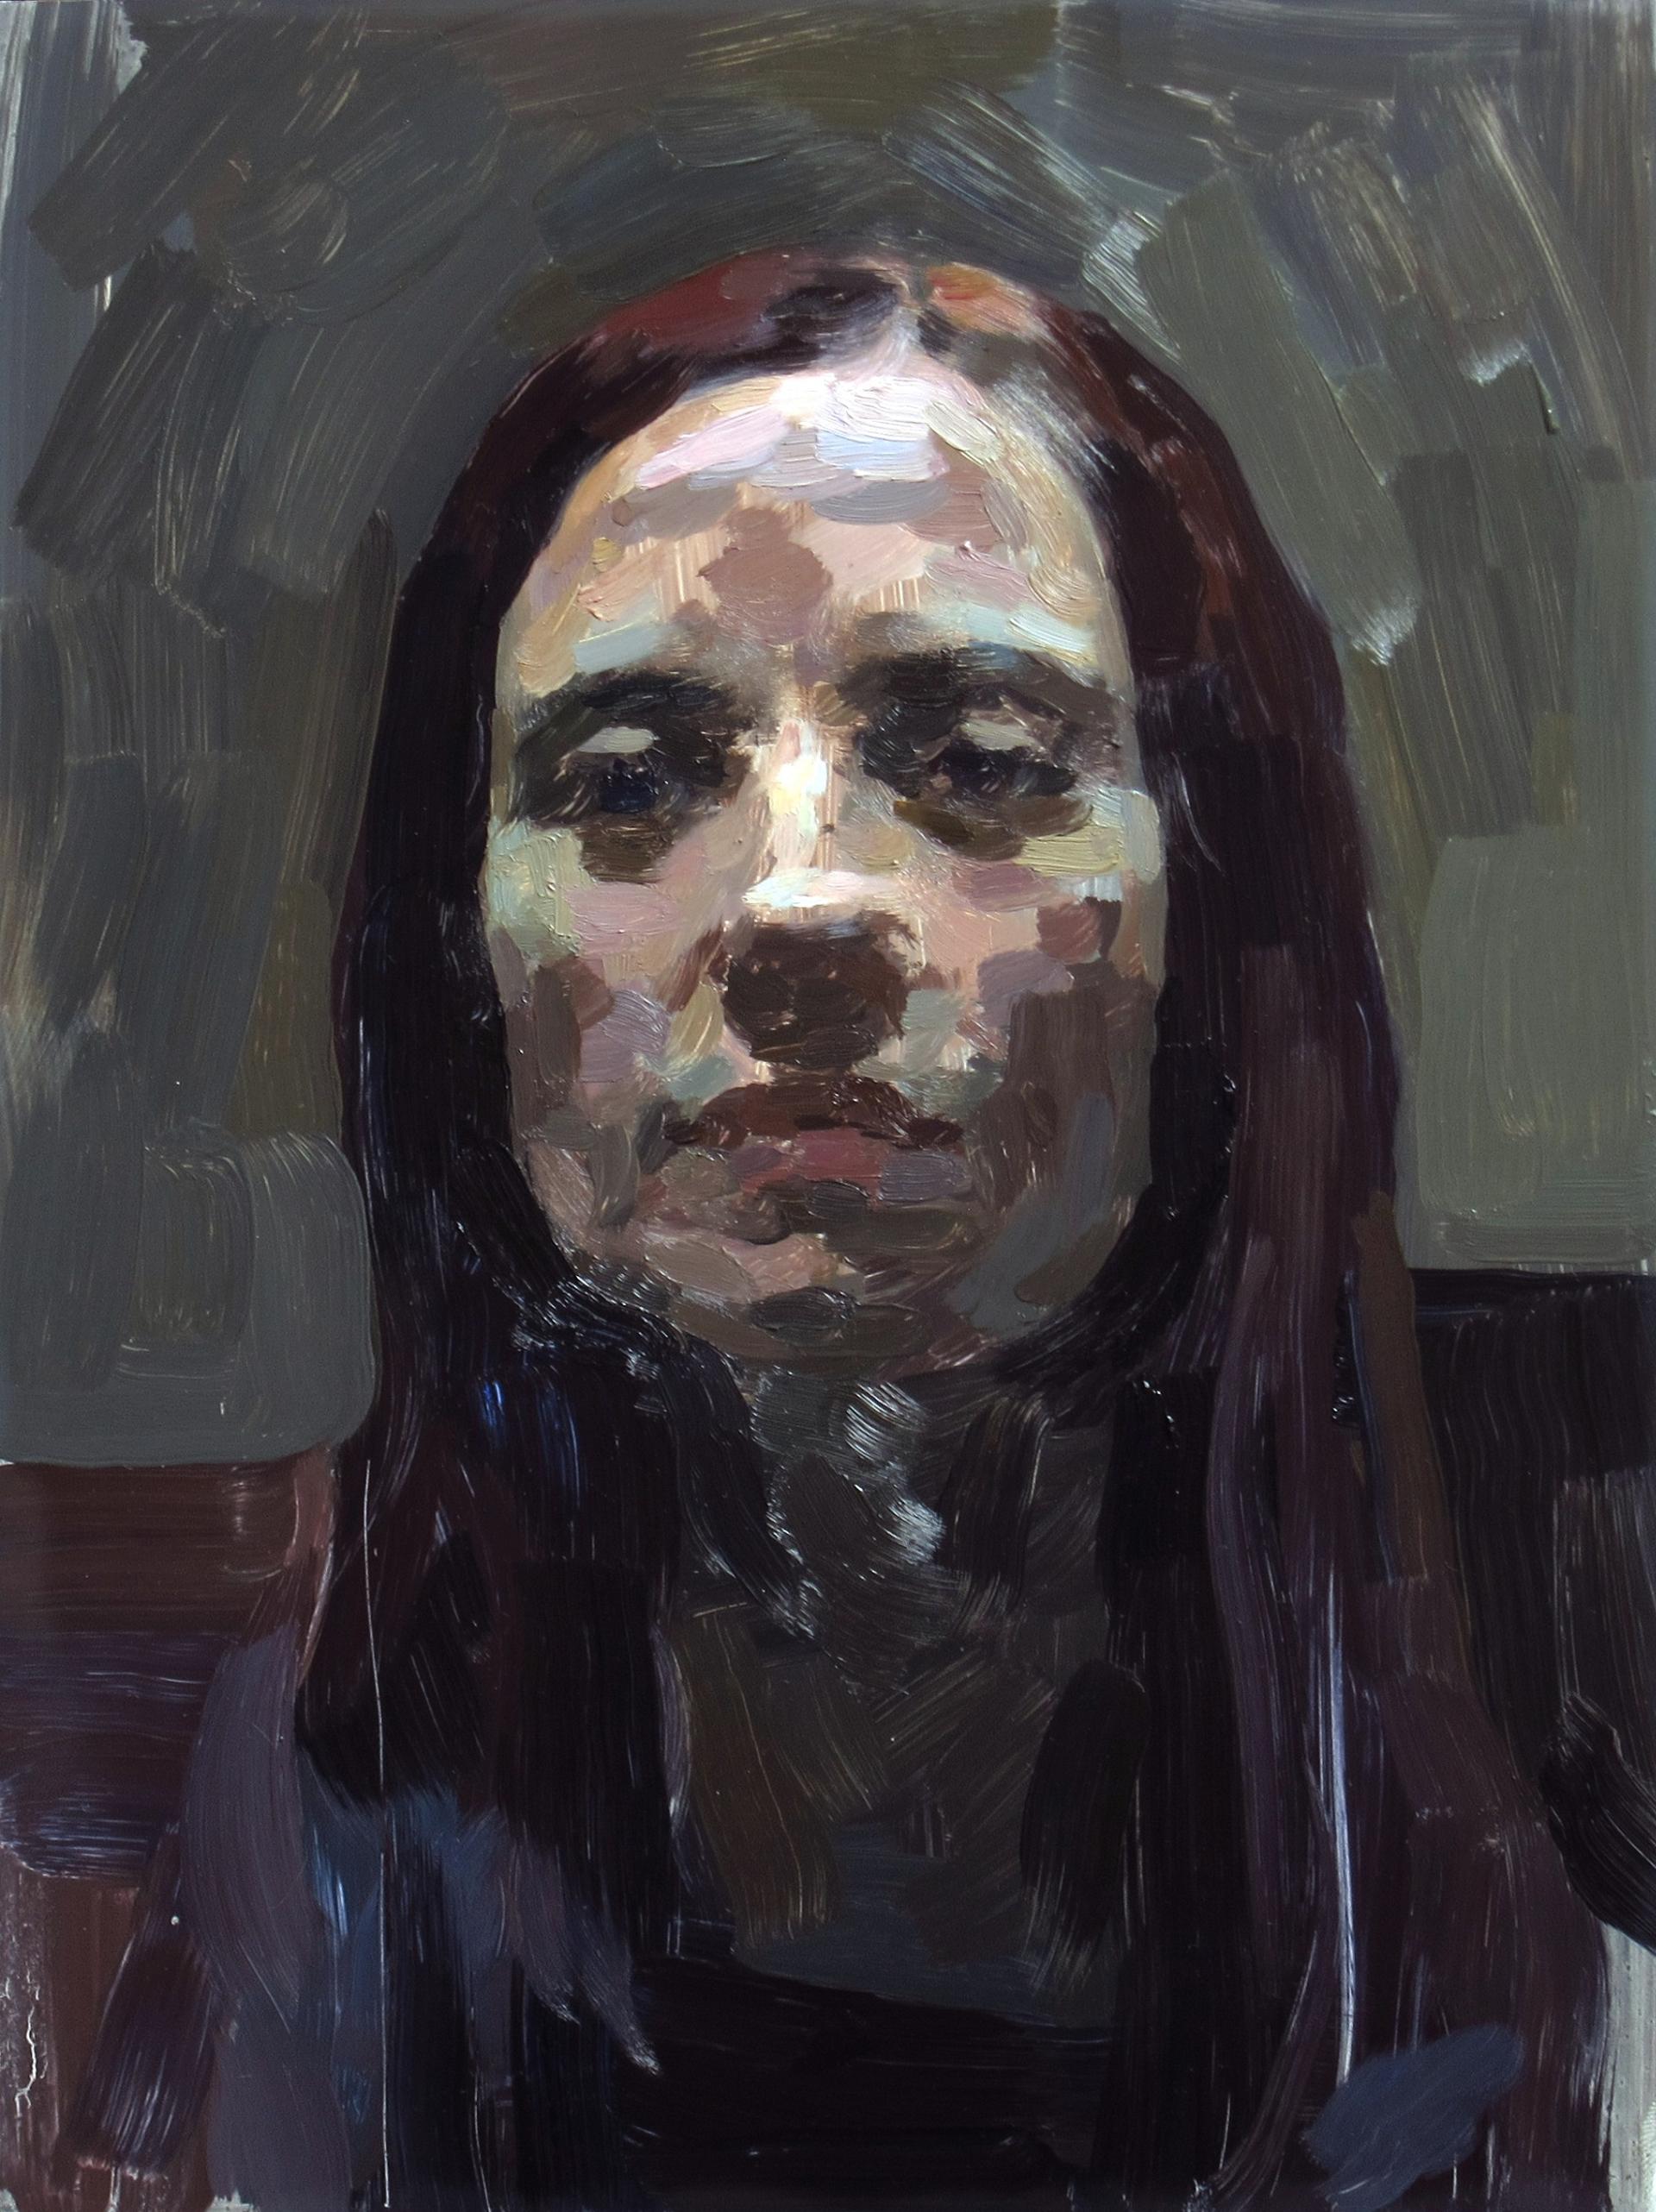 Behind Your Eyes by Hollis Dunlap